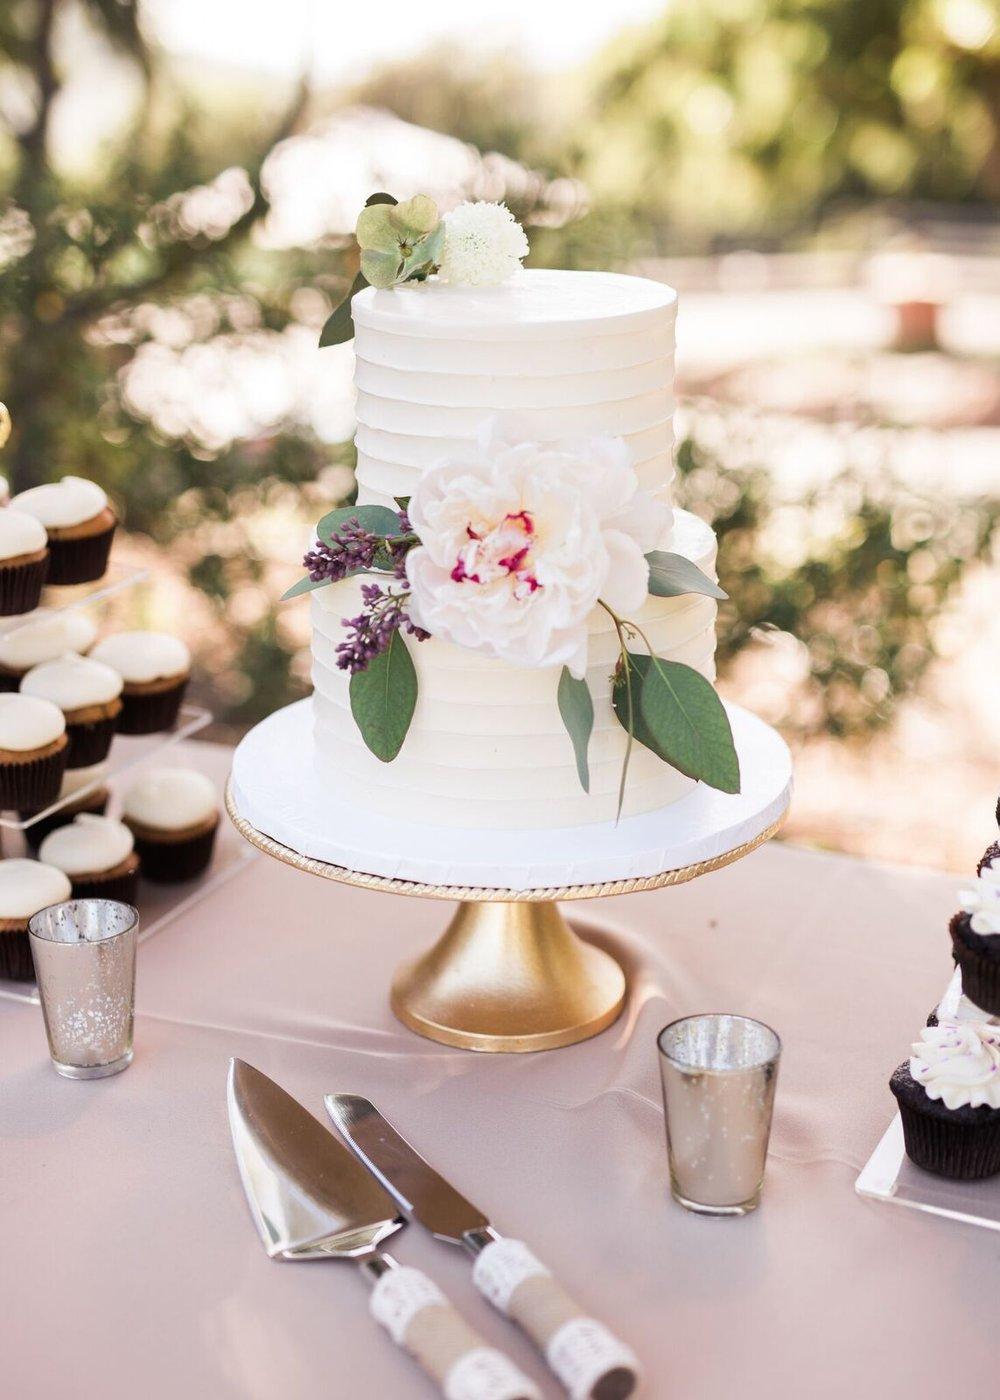 genny-aaron-wedding-burlap-and-bordeaux-sara-wier-photography-78_preview.jpg